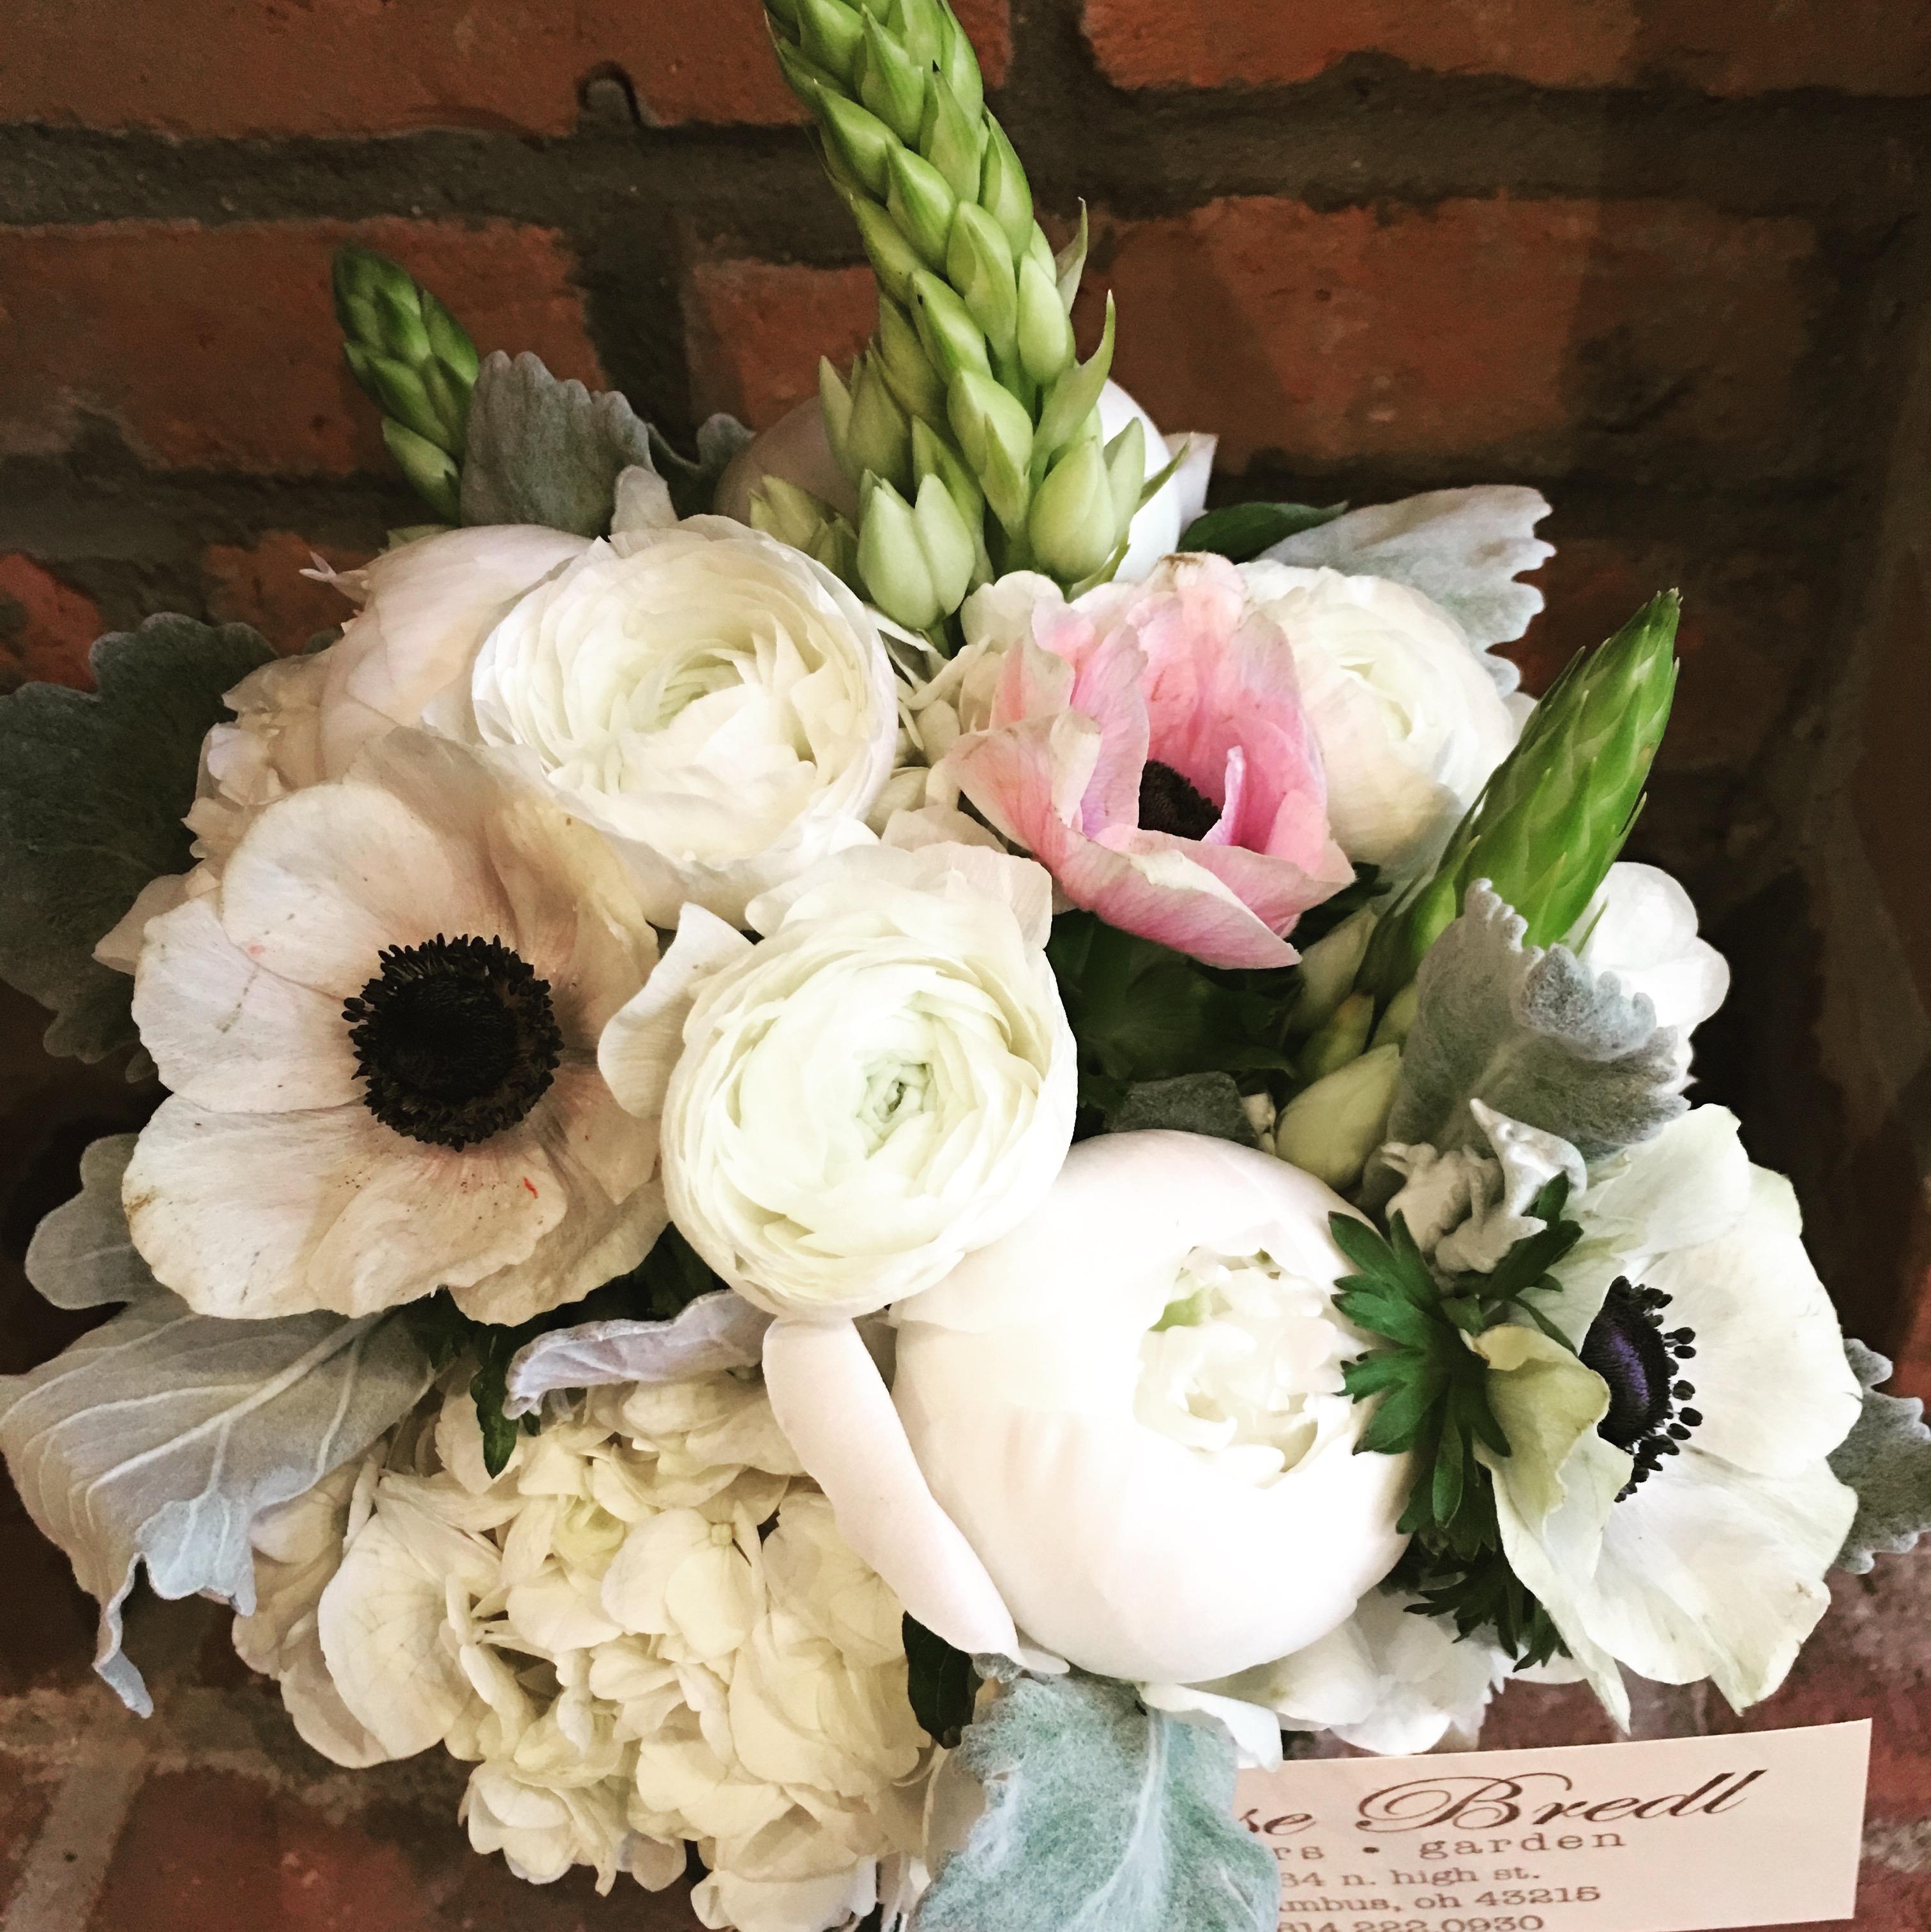 Home rose bredl columbus ohio wedding and event flowers columbus ohio wedding and event flowers izmirmasajfo